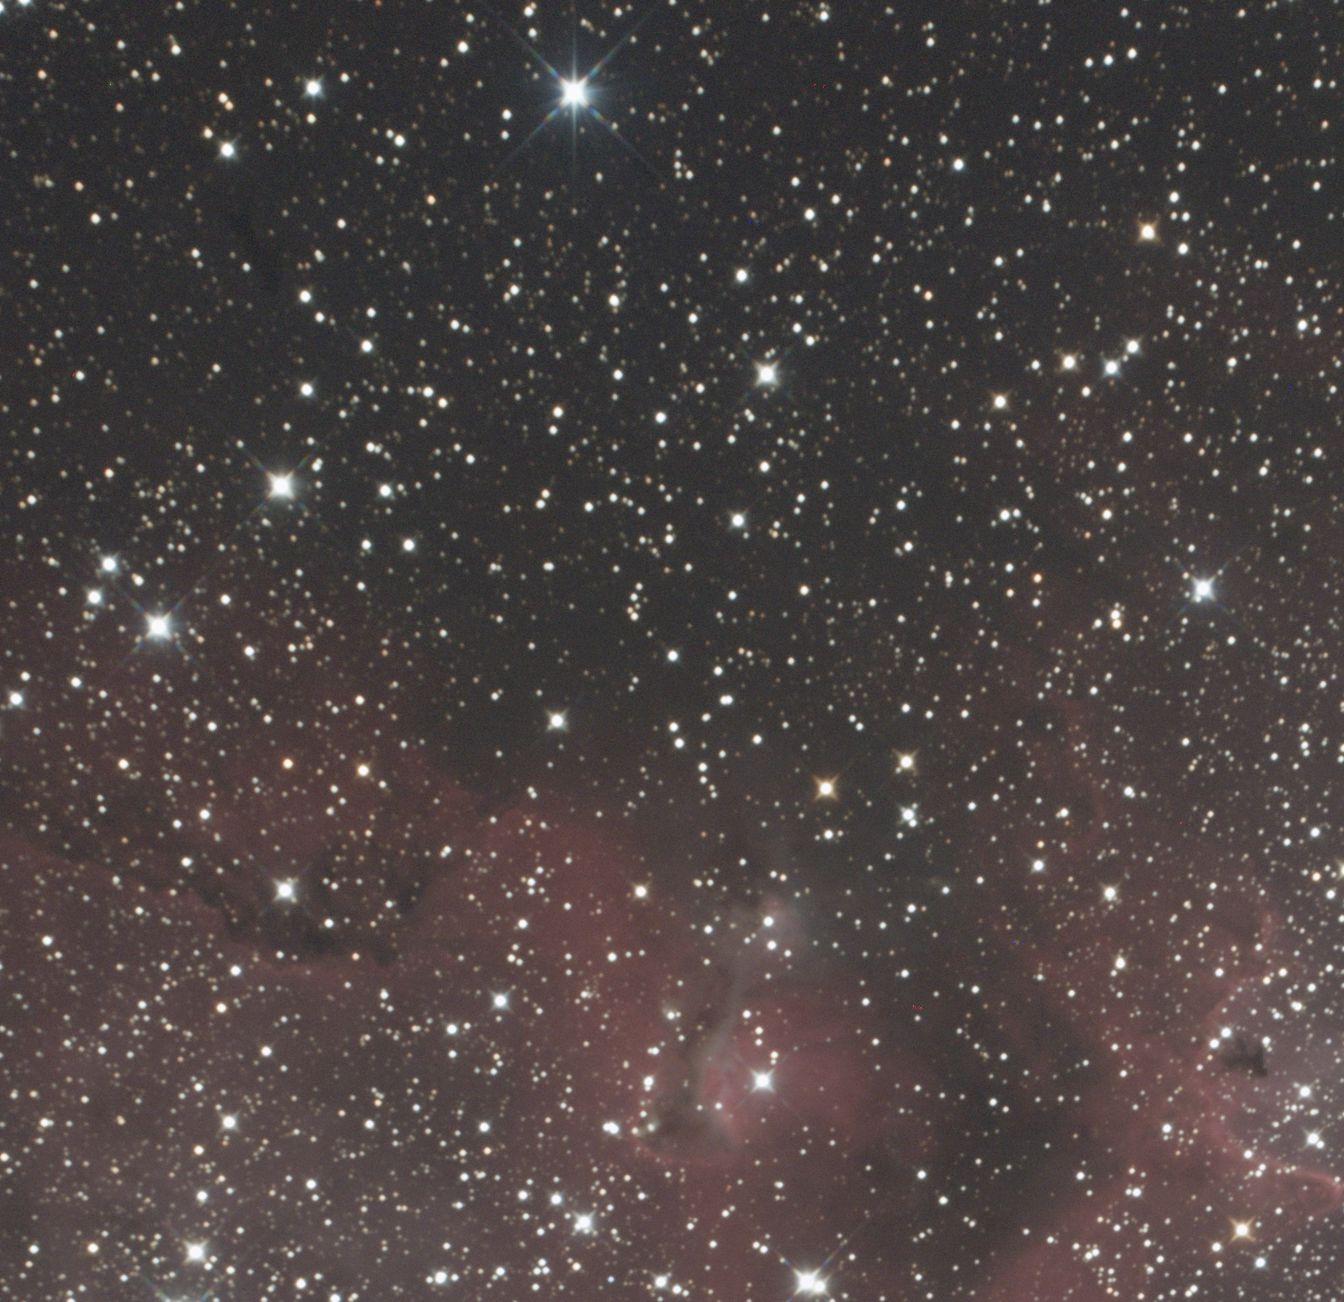 f:id:snct-astro:20210103172350j:plain